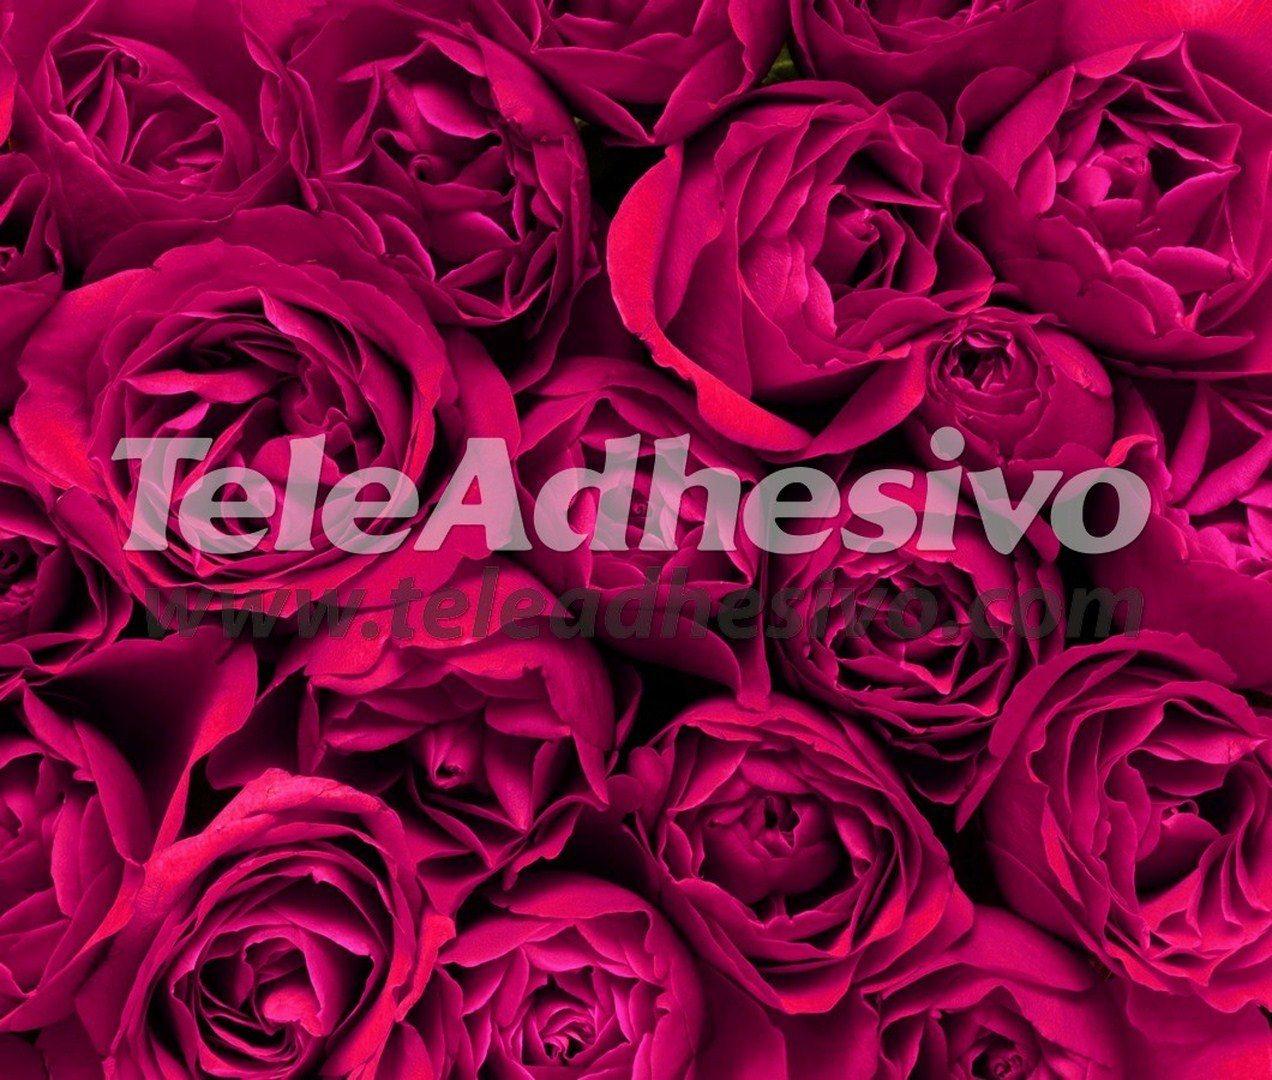 Fototapeten: Blumen 3